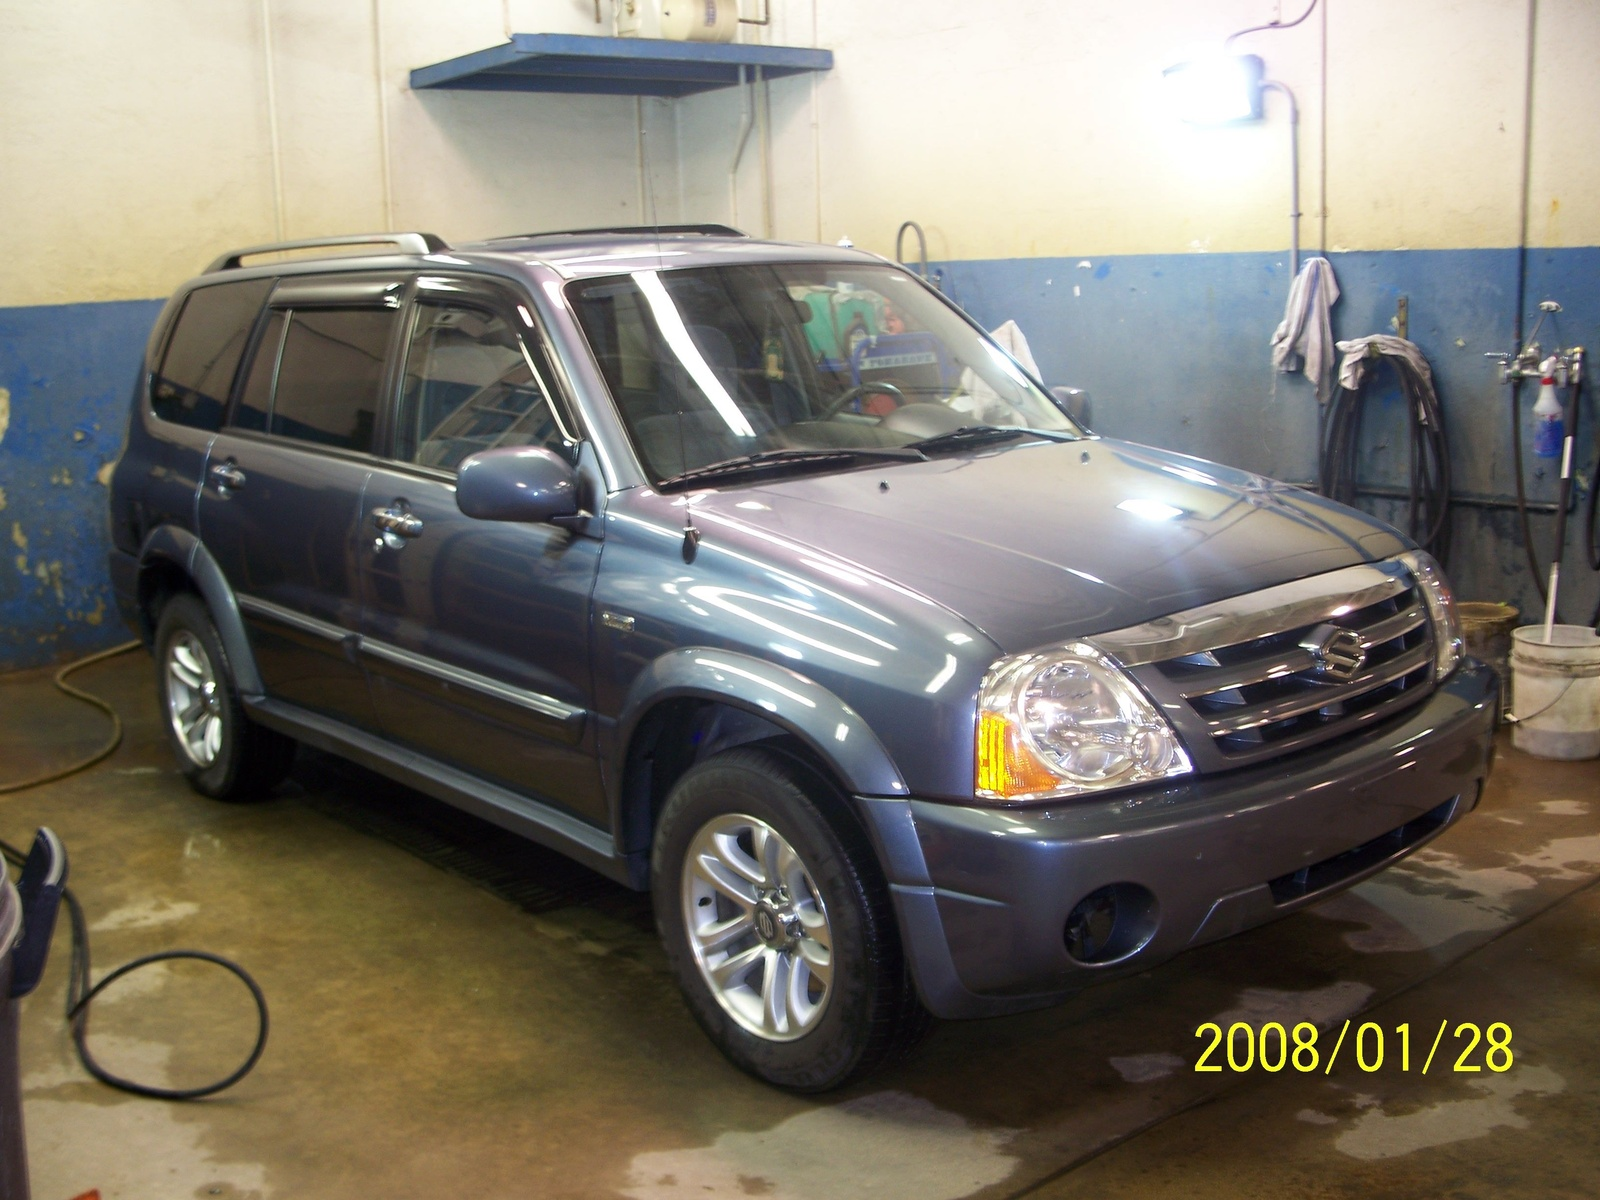 2004 suzuki xl 7 reviews - 2004 Car Review Suzuki Xl 7 Ex 4wd